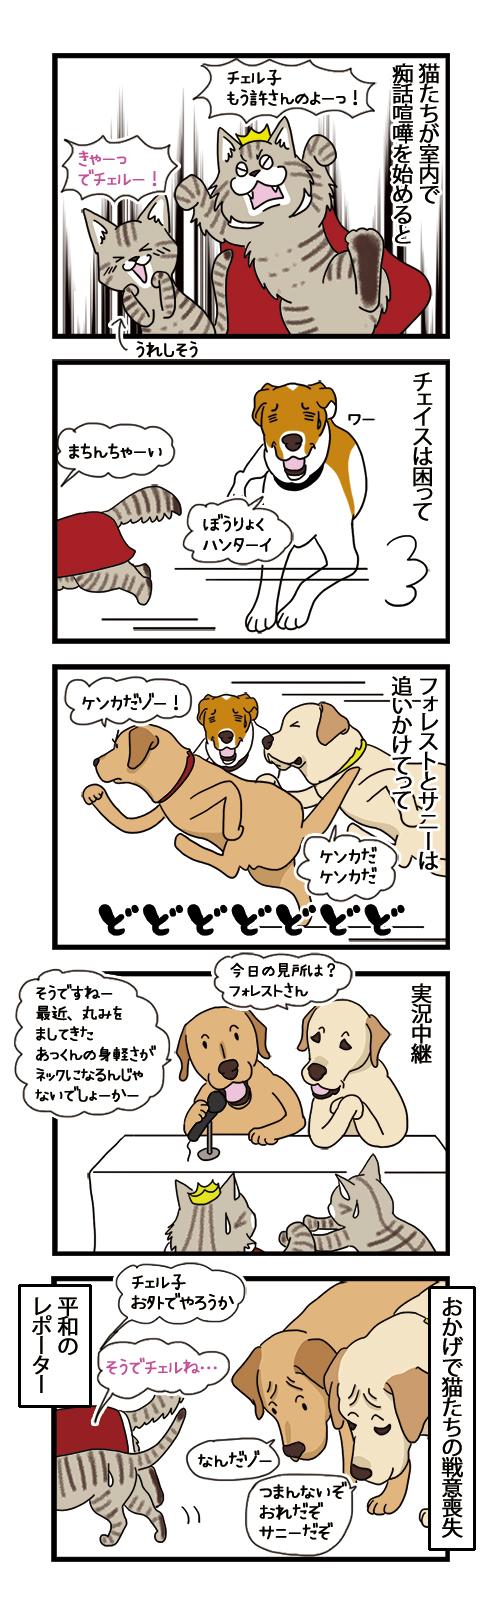 25112020_dogcomic.jpg